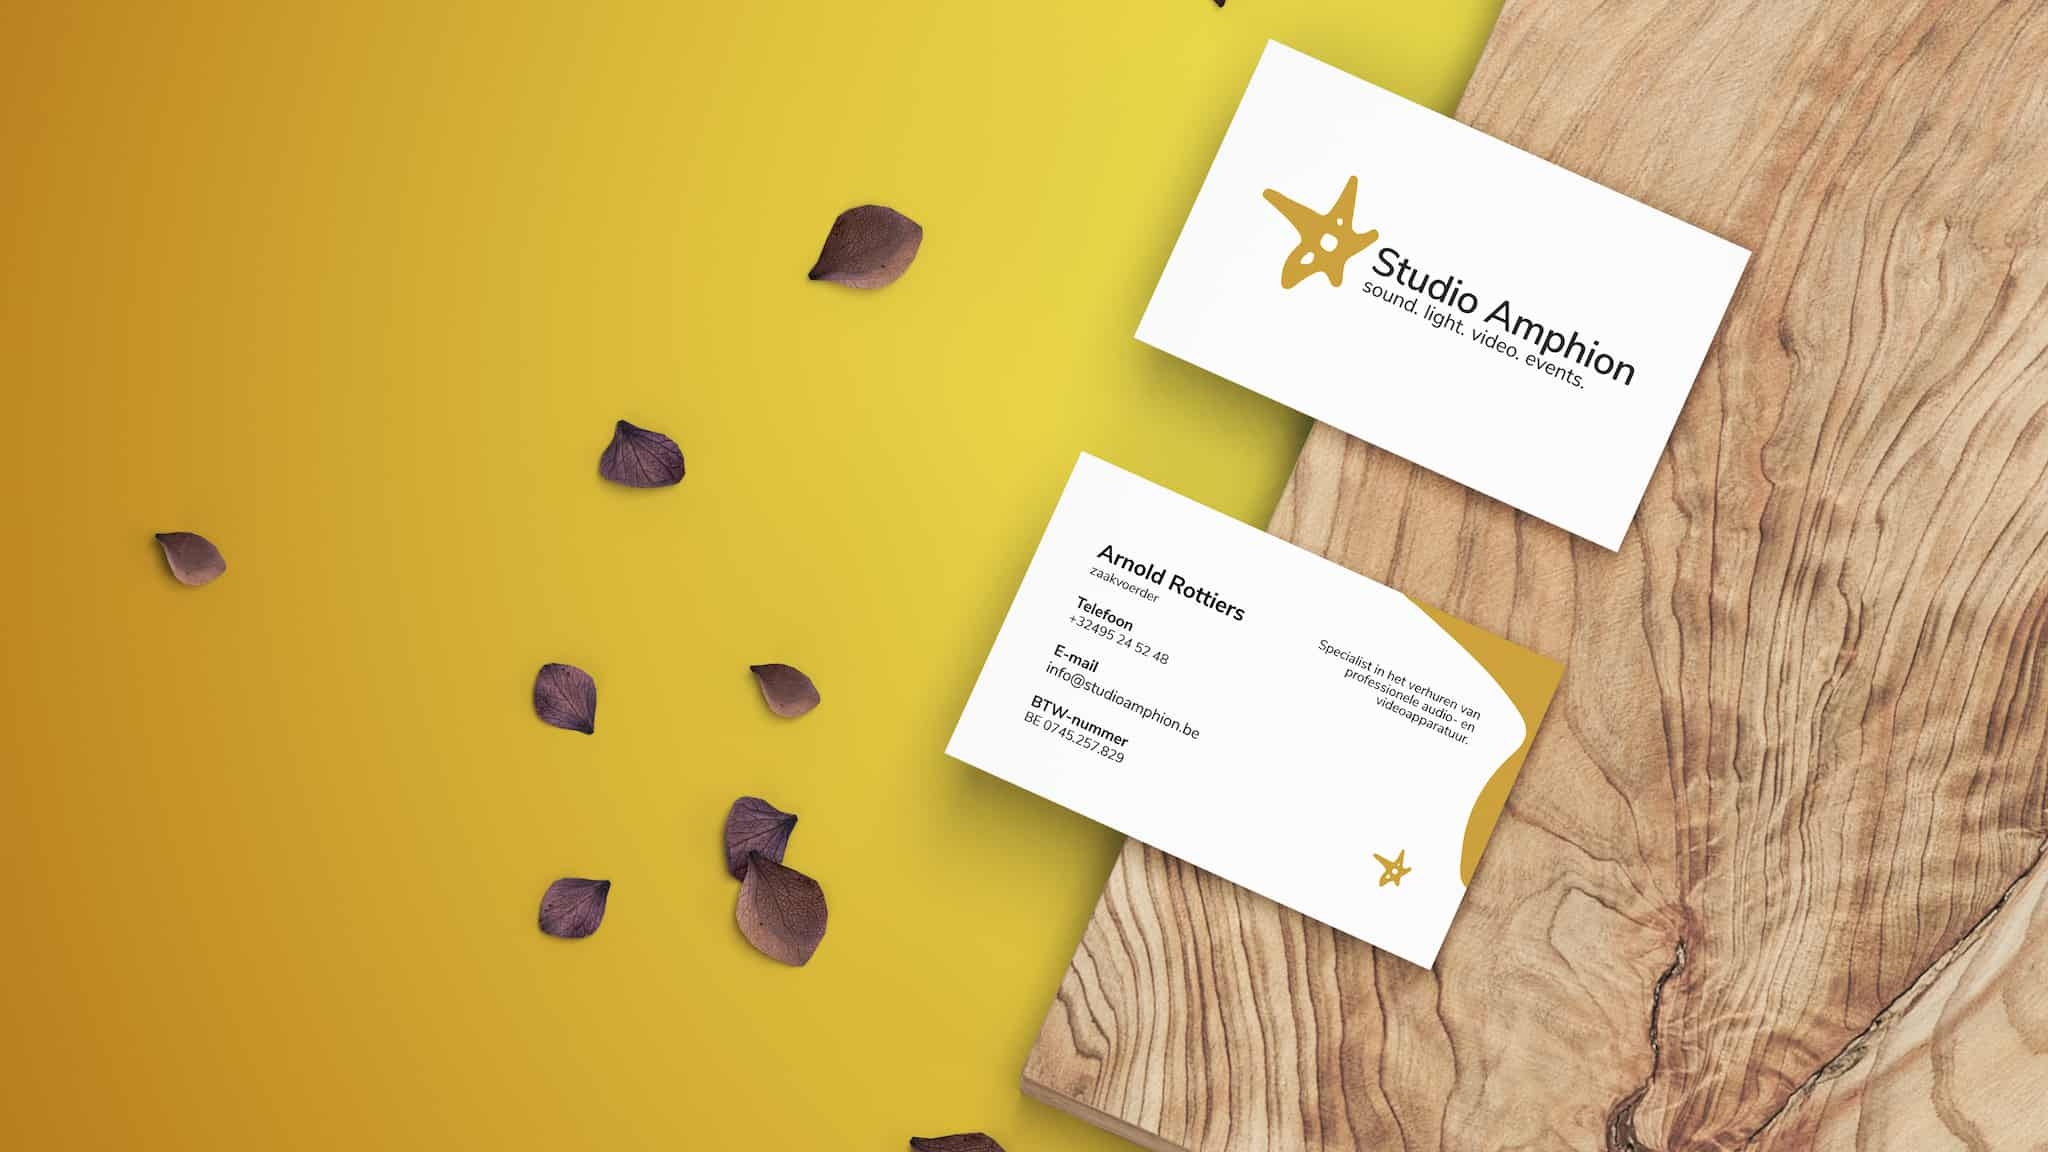 Larkom portfolio Studio Amphion business card v1 1